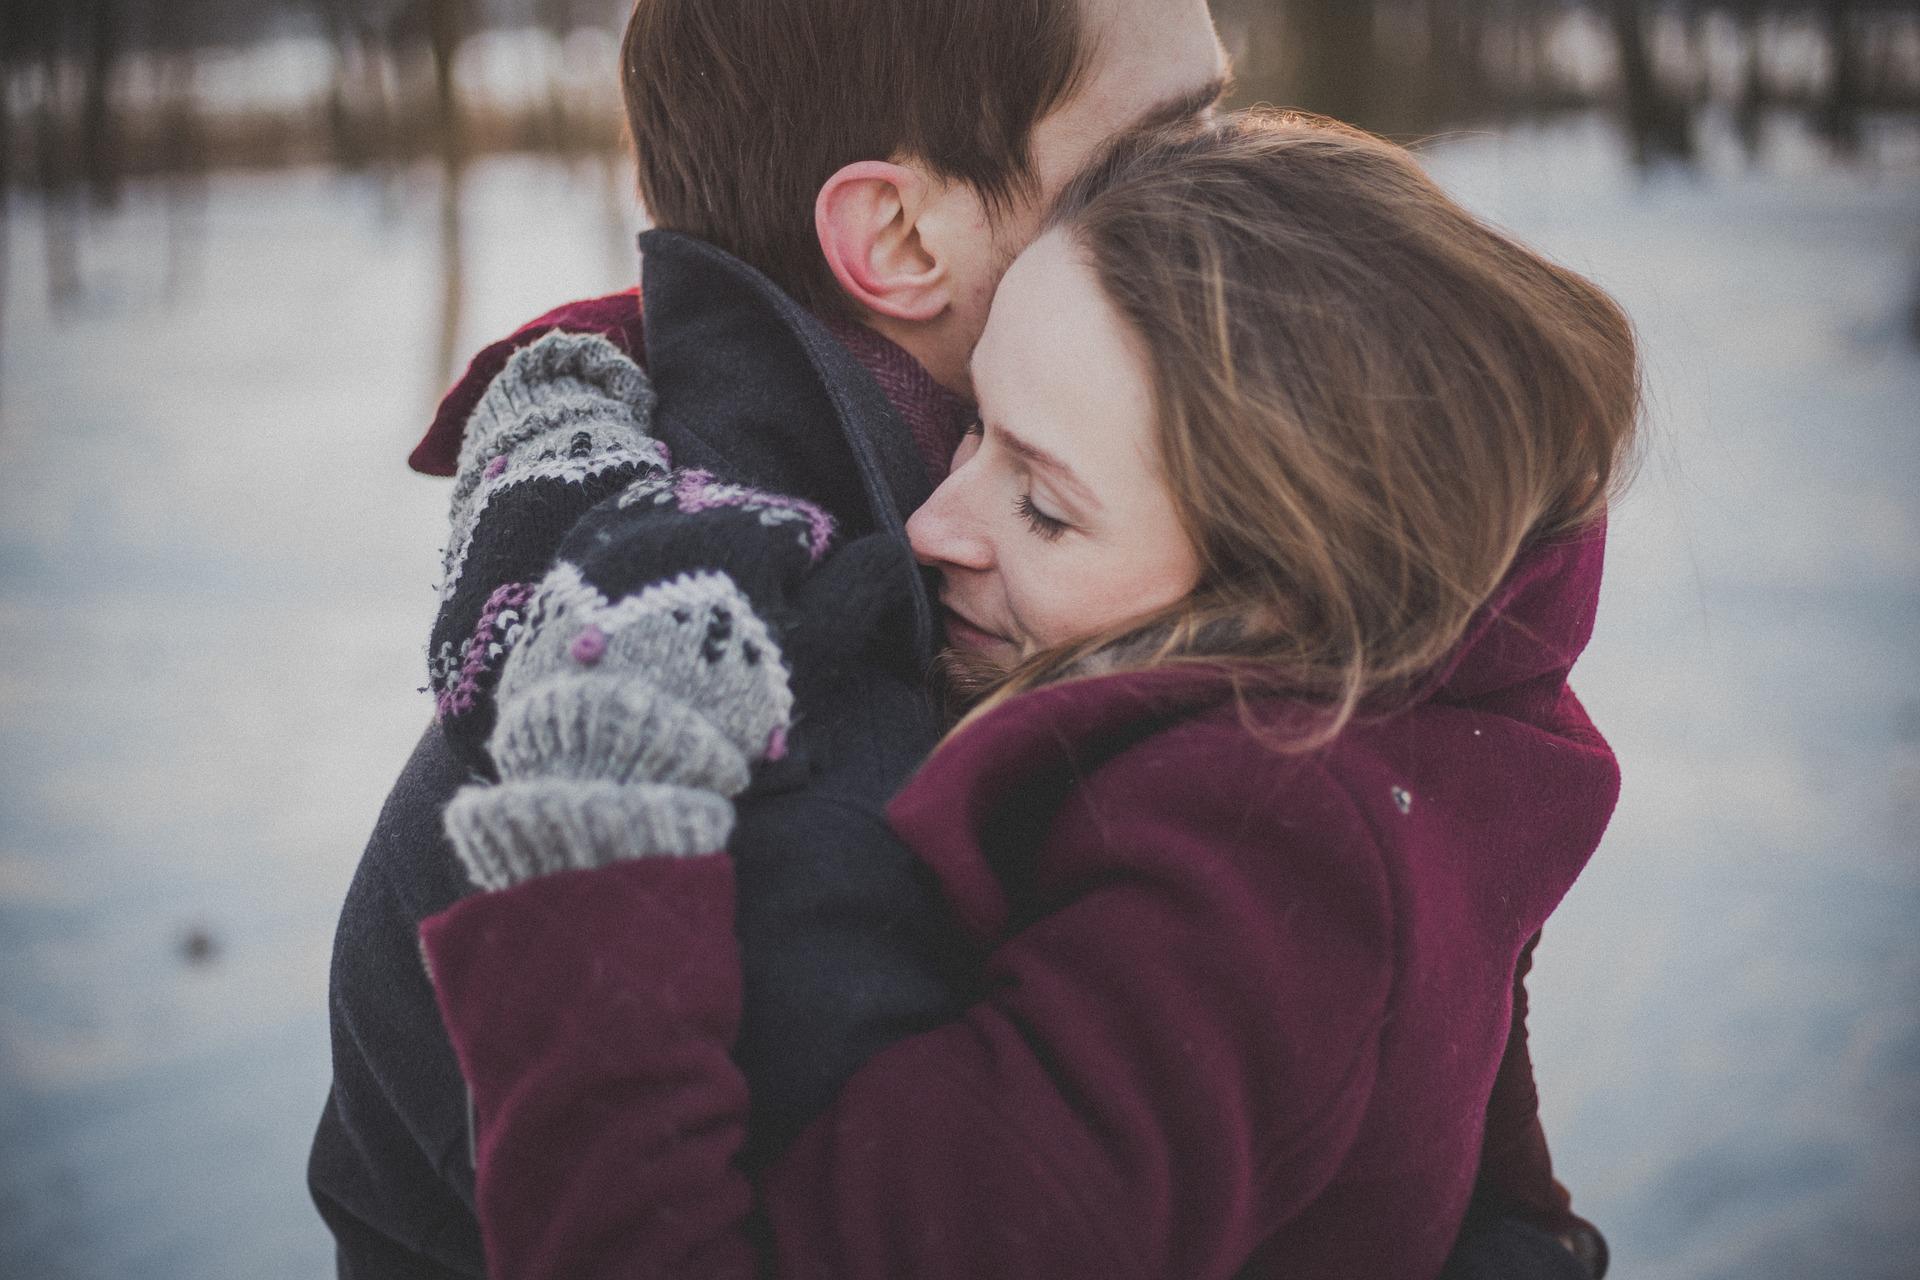 Abrazo para aliviar la angustia